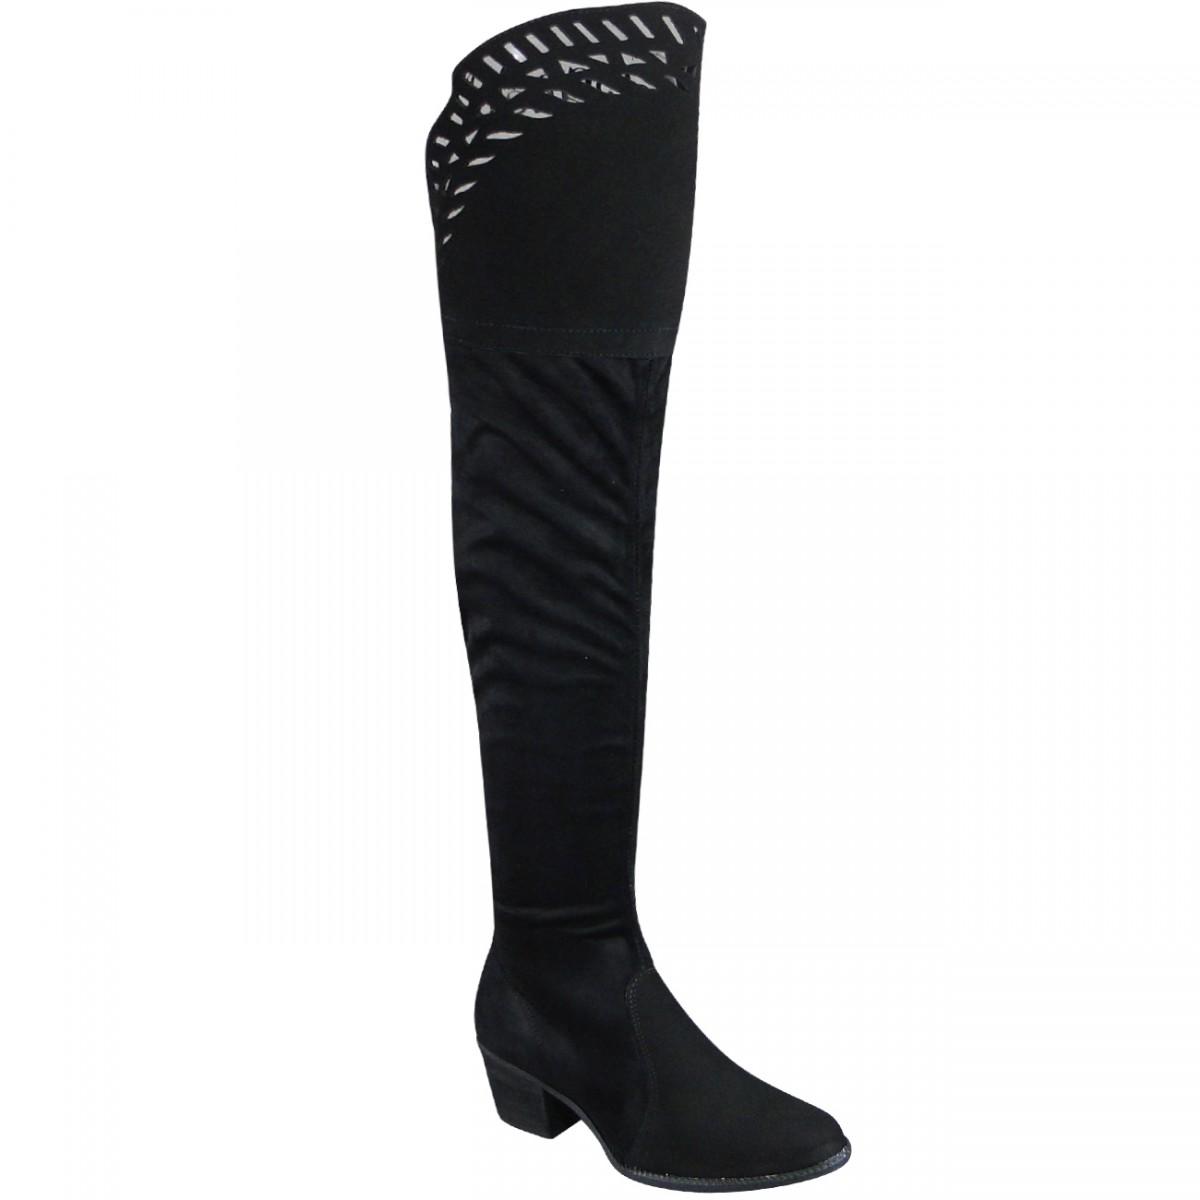 75c0fa0f6 Bota Tanara 0222 T0222 0001 - Preto - Chuteira Nike, Adidas. Sandalias  Femininas. Sandy Calçados